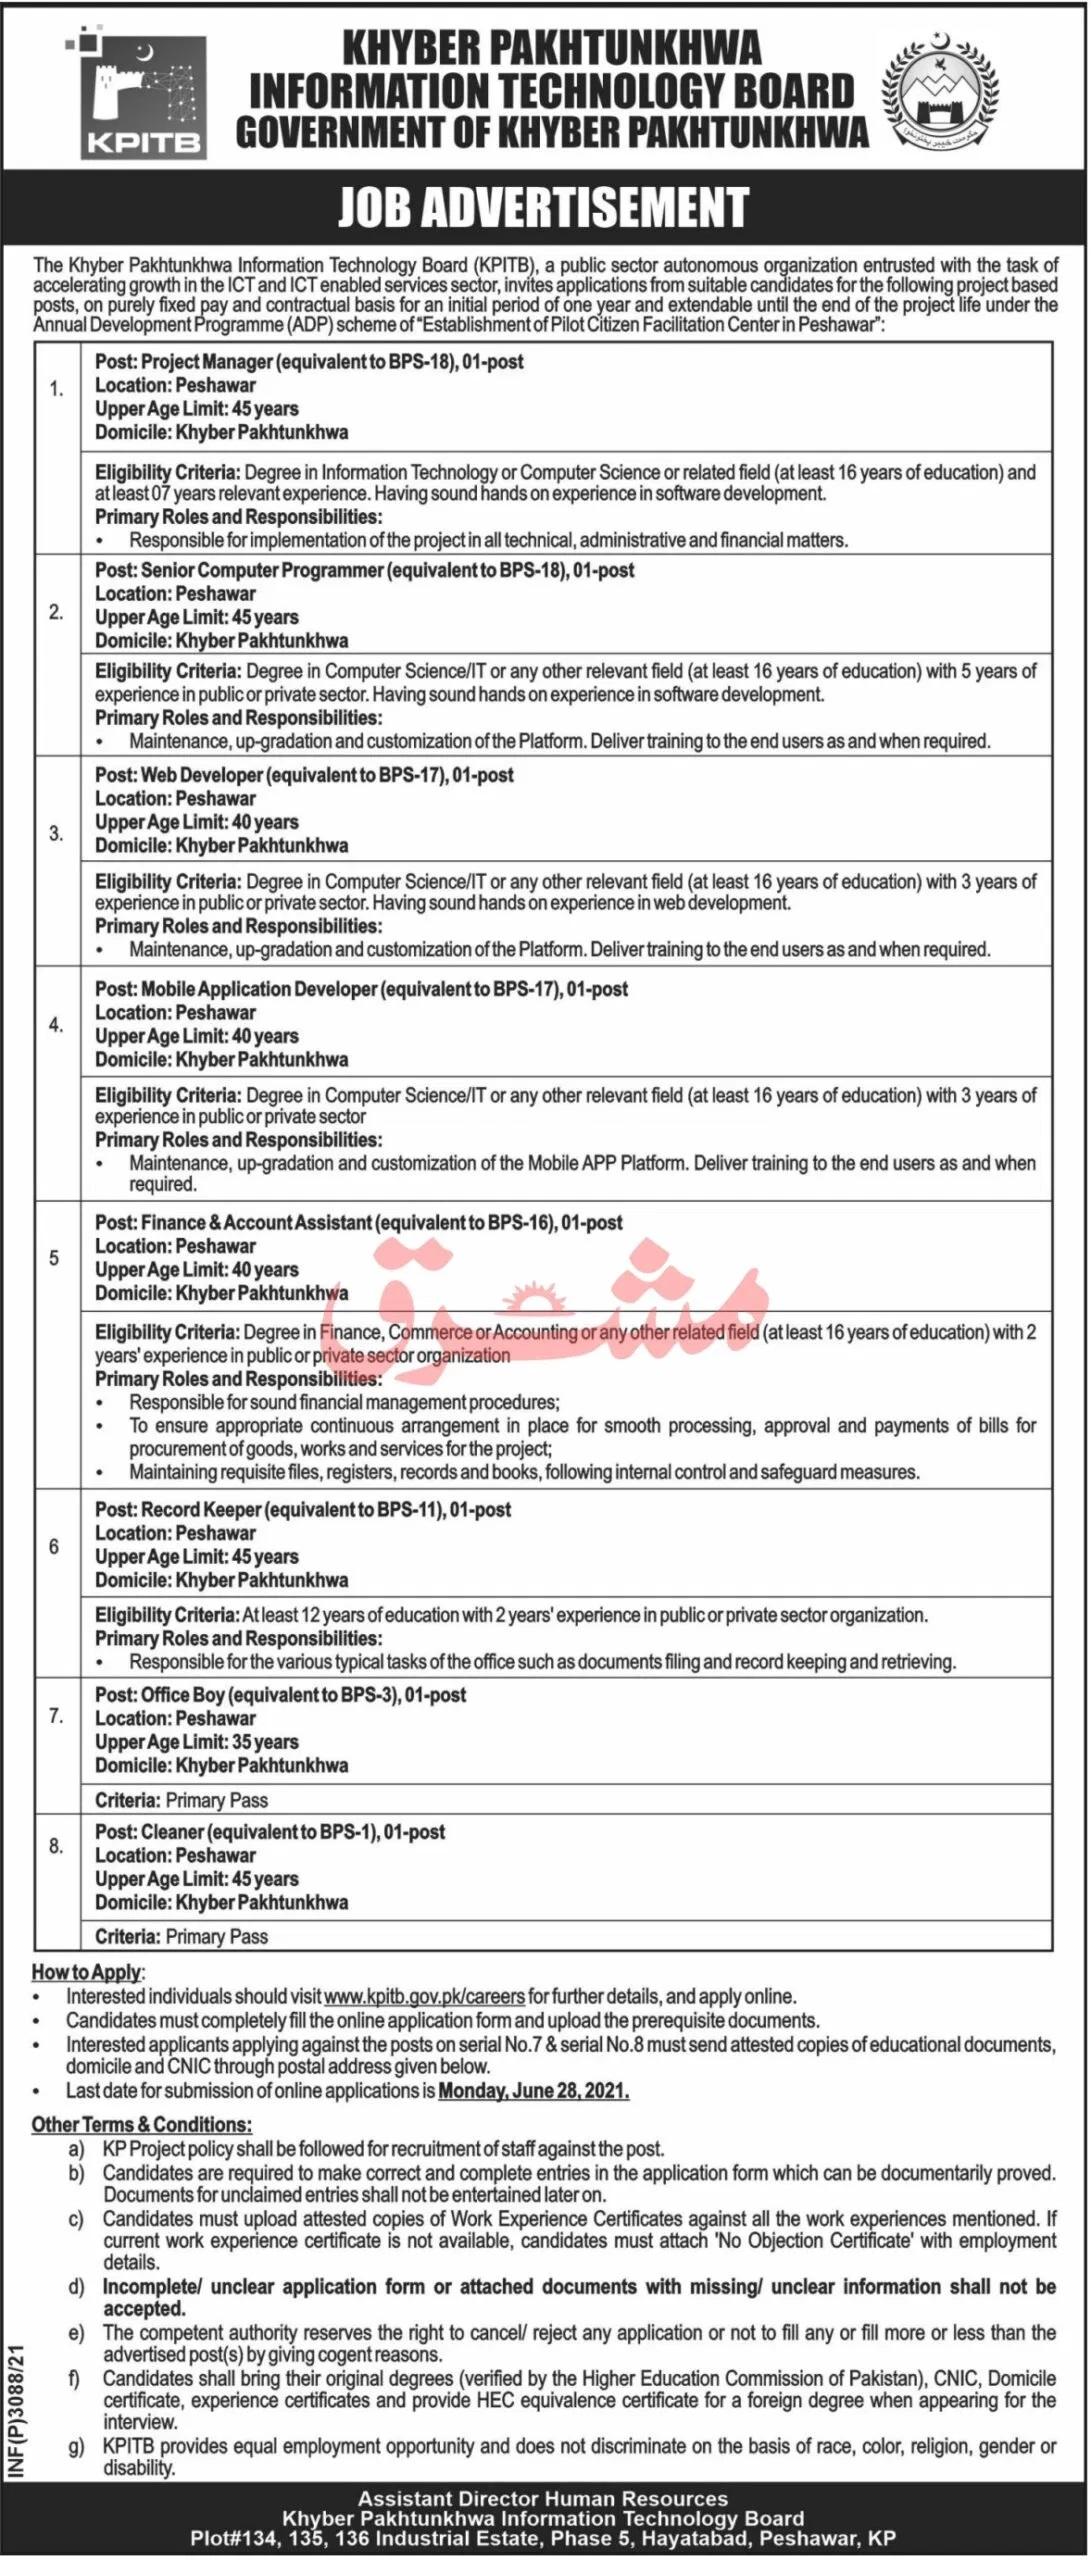 KPITB Khyber Pakhtunkhwa Information Technology Board Jobs